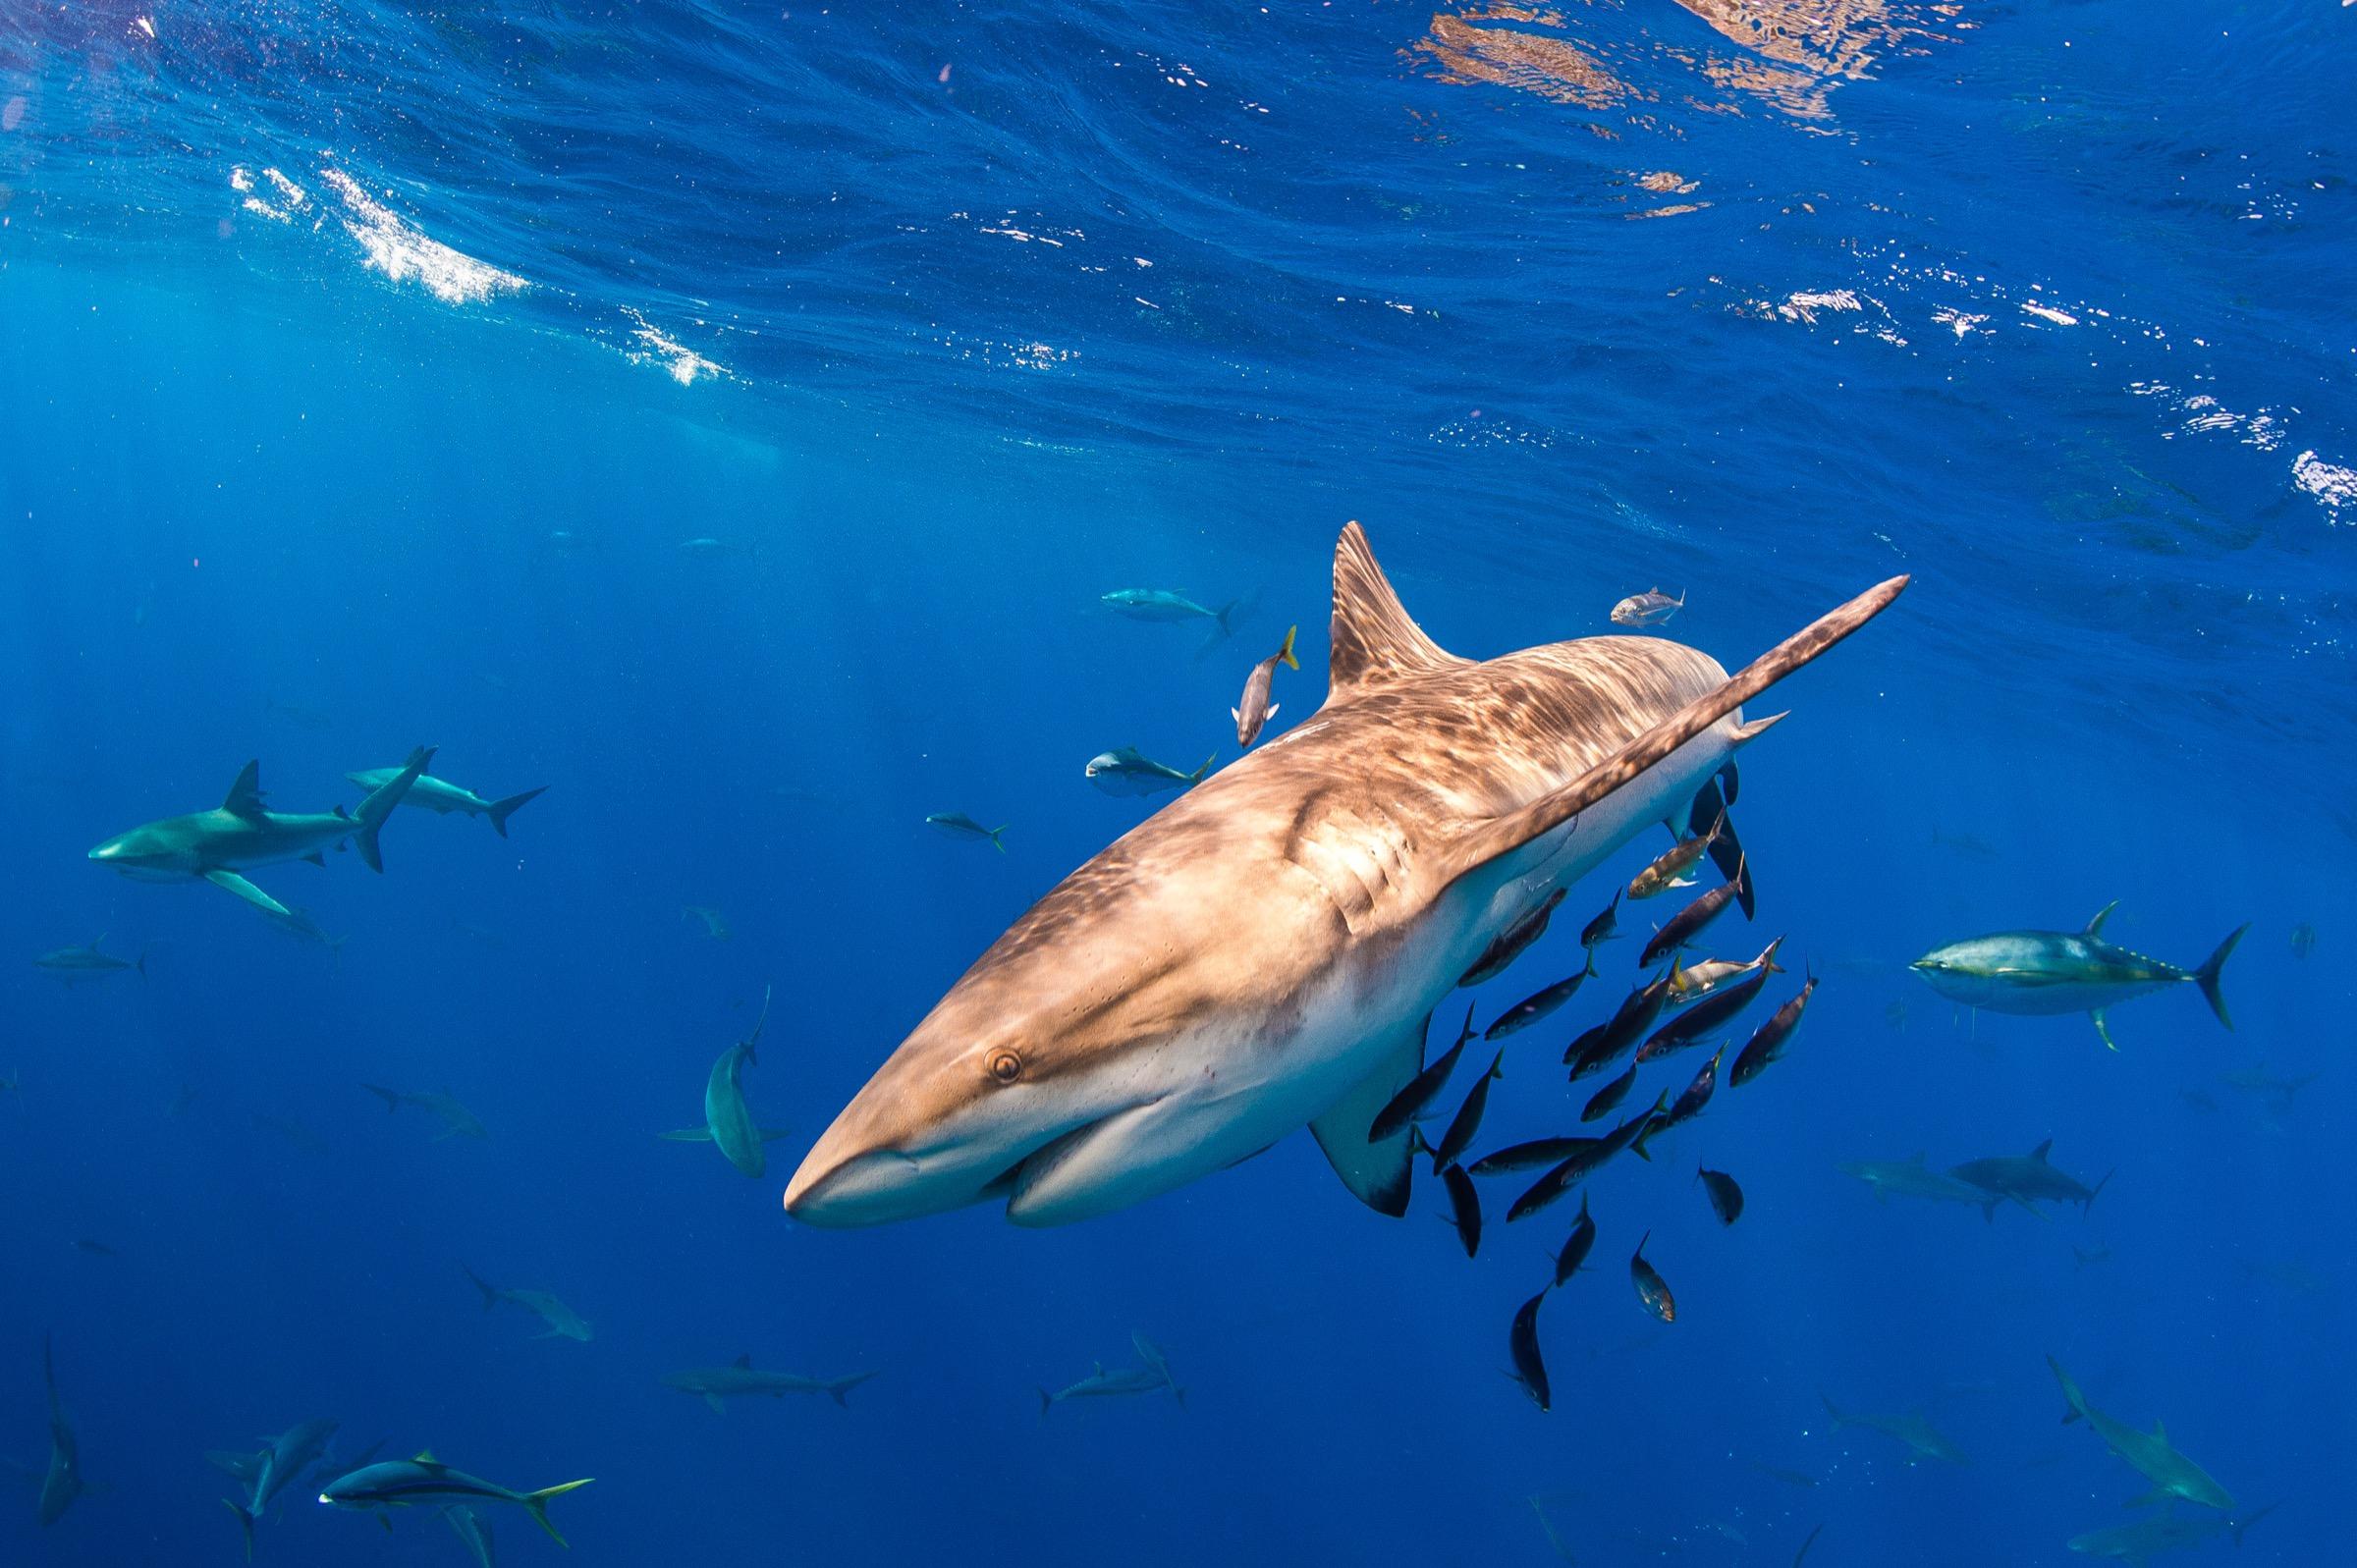 Baitfish seek shelter under the body of a Galapagos shark (<em>Carcharhinus galapagensis</em>) off Mexico's Revillagigedo Archipelago.